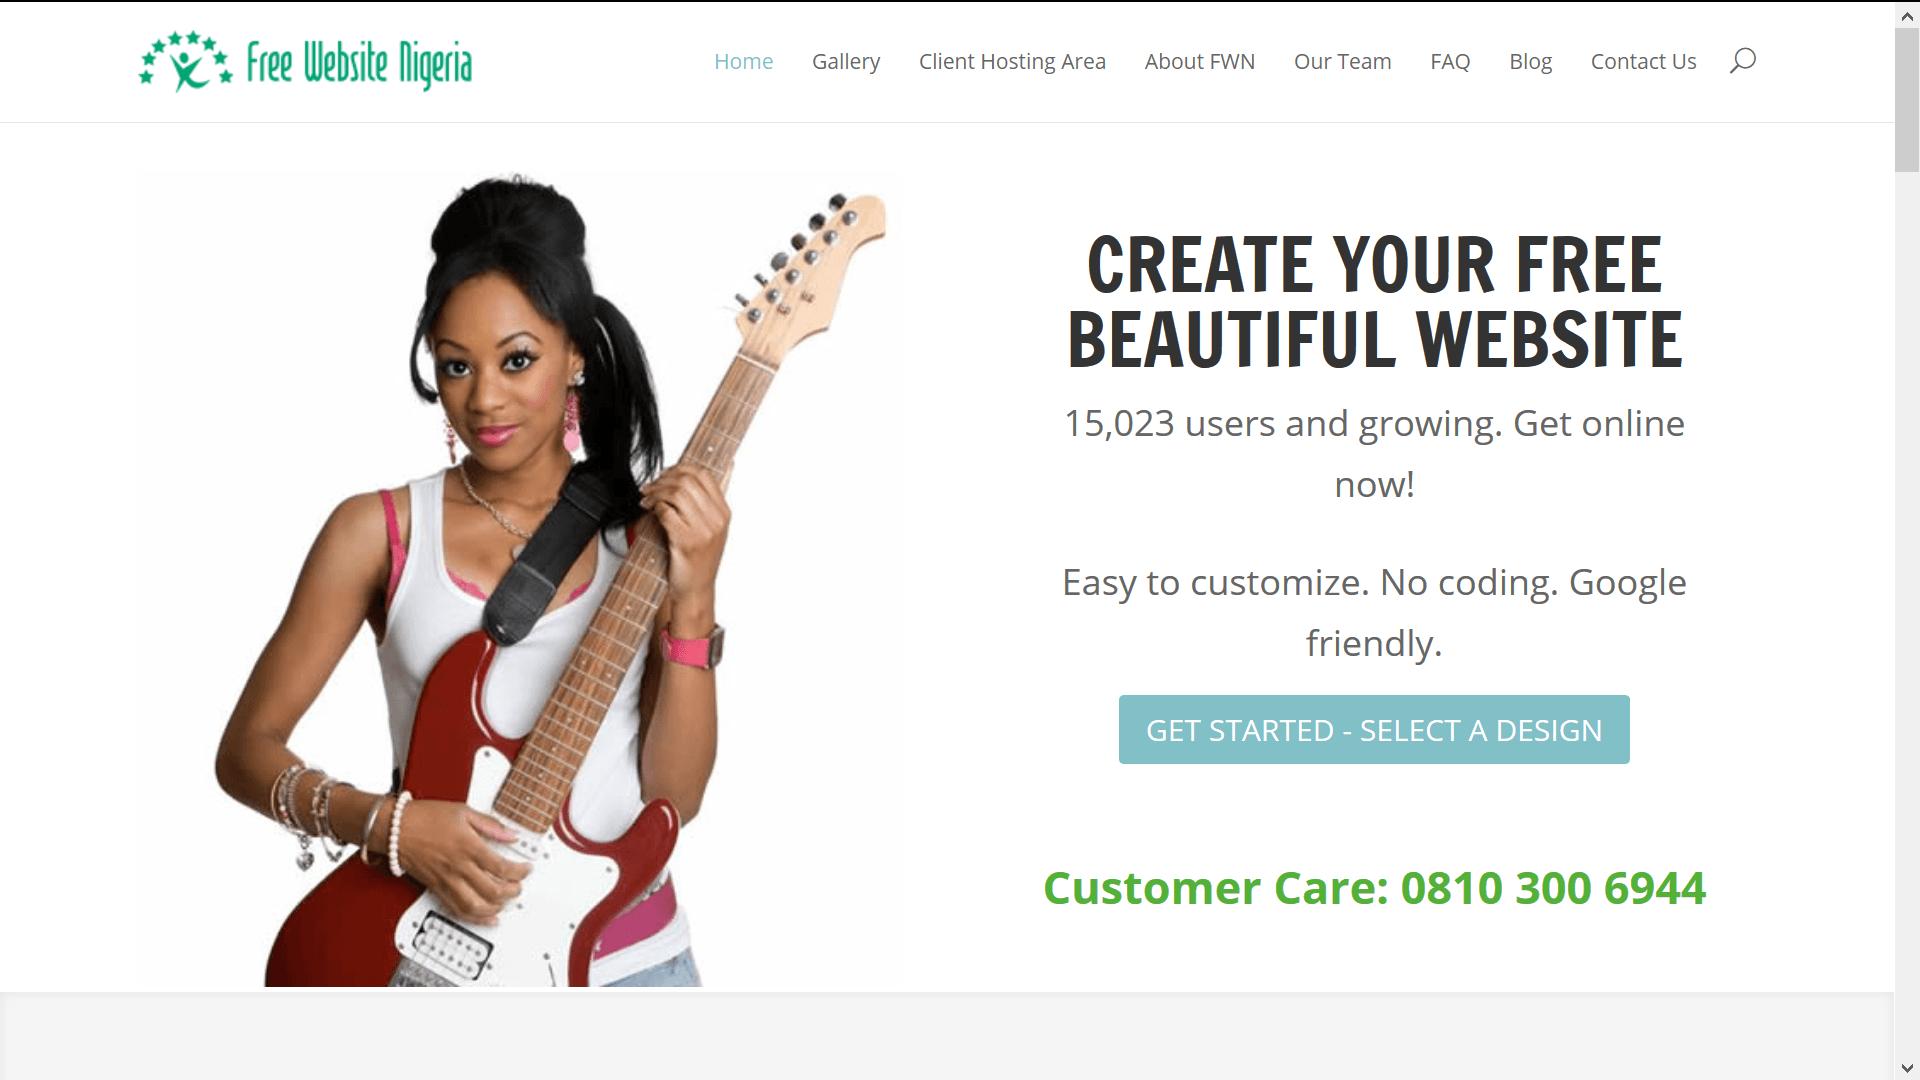 Free Website Nigeria